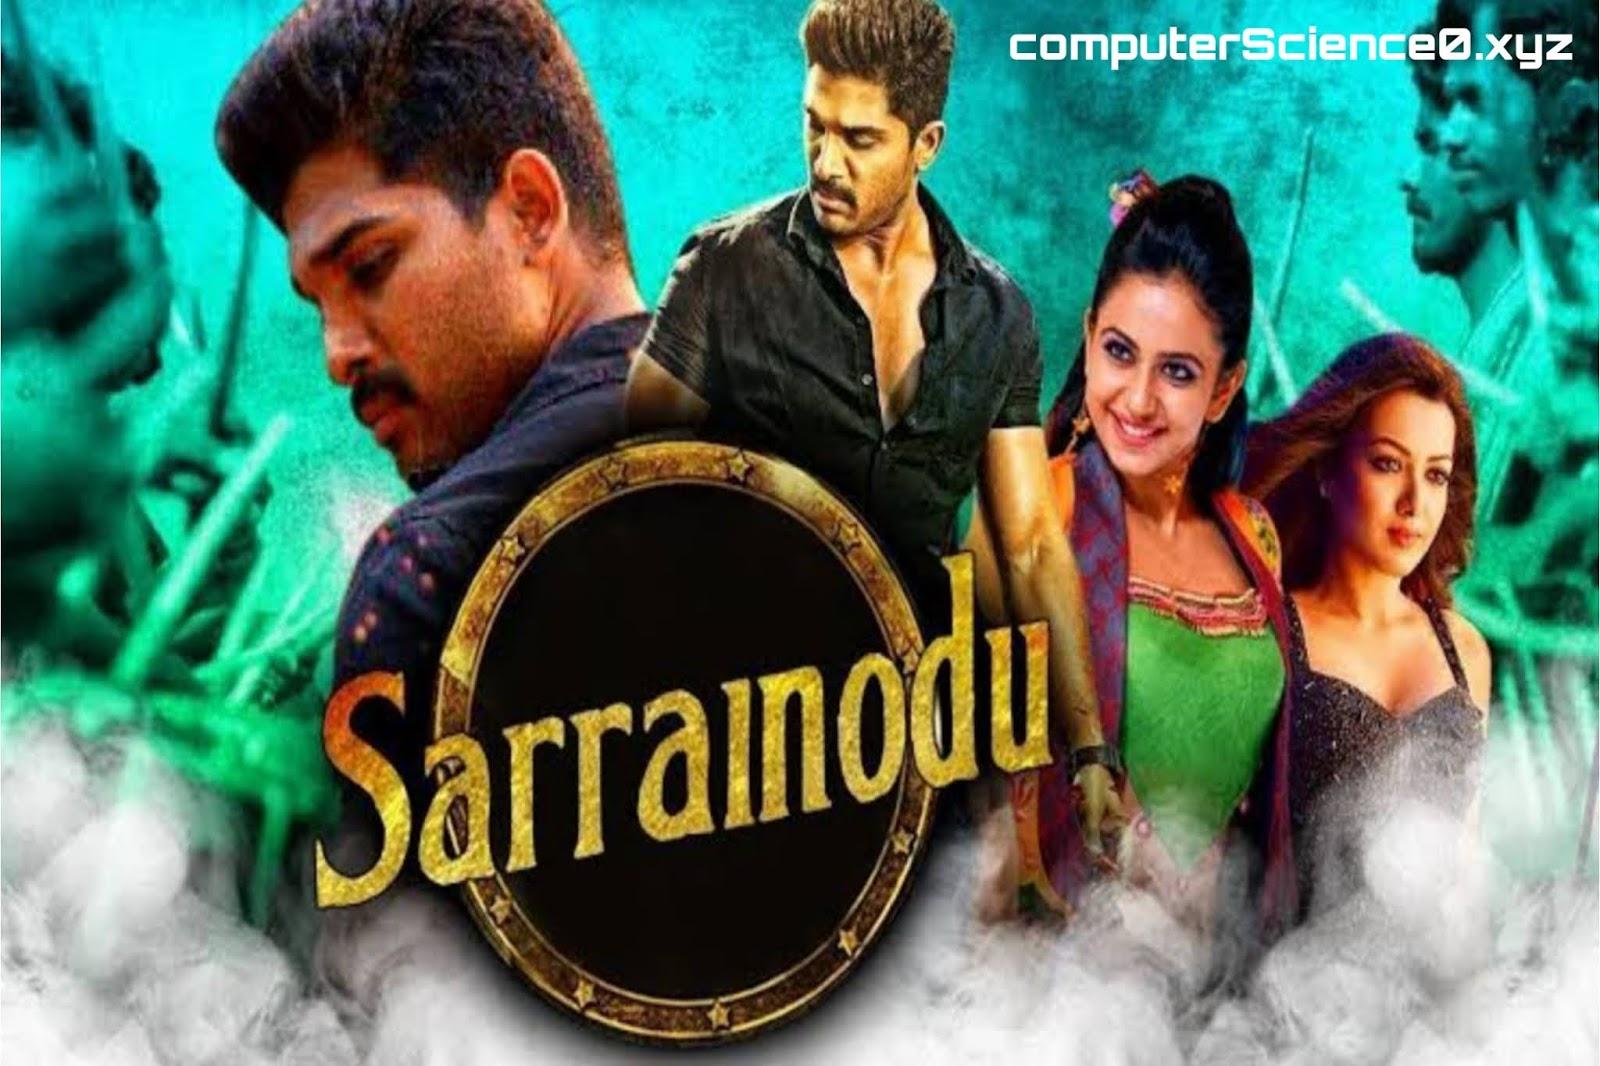 Sarrainodu Allu Arjun's Top 19 movies of all time